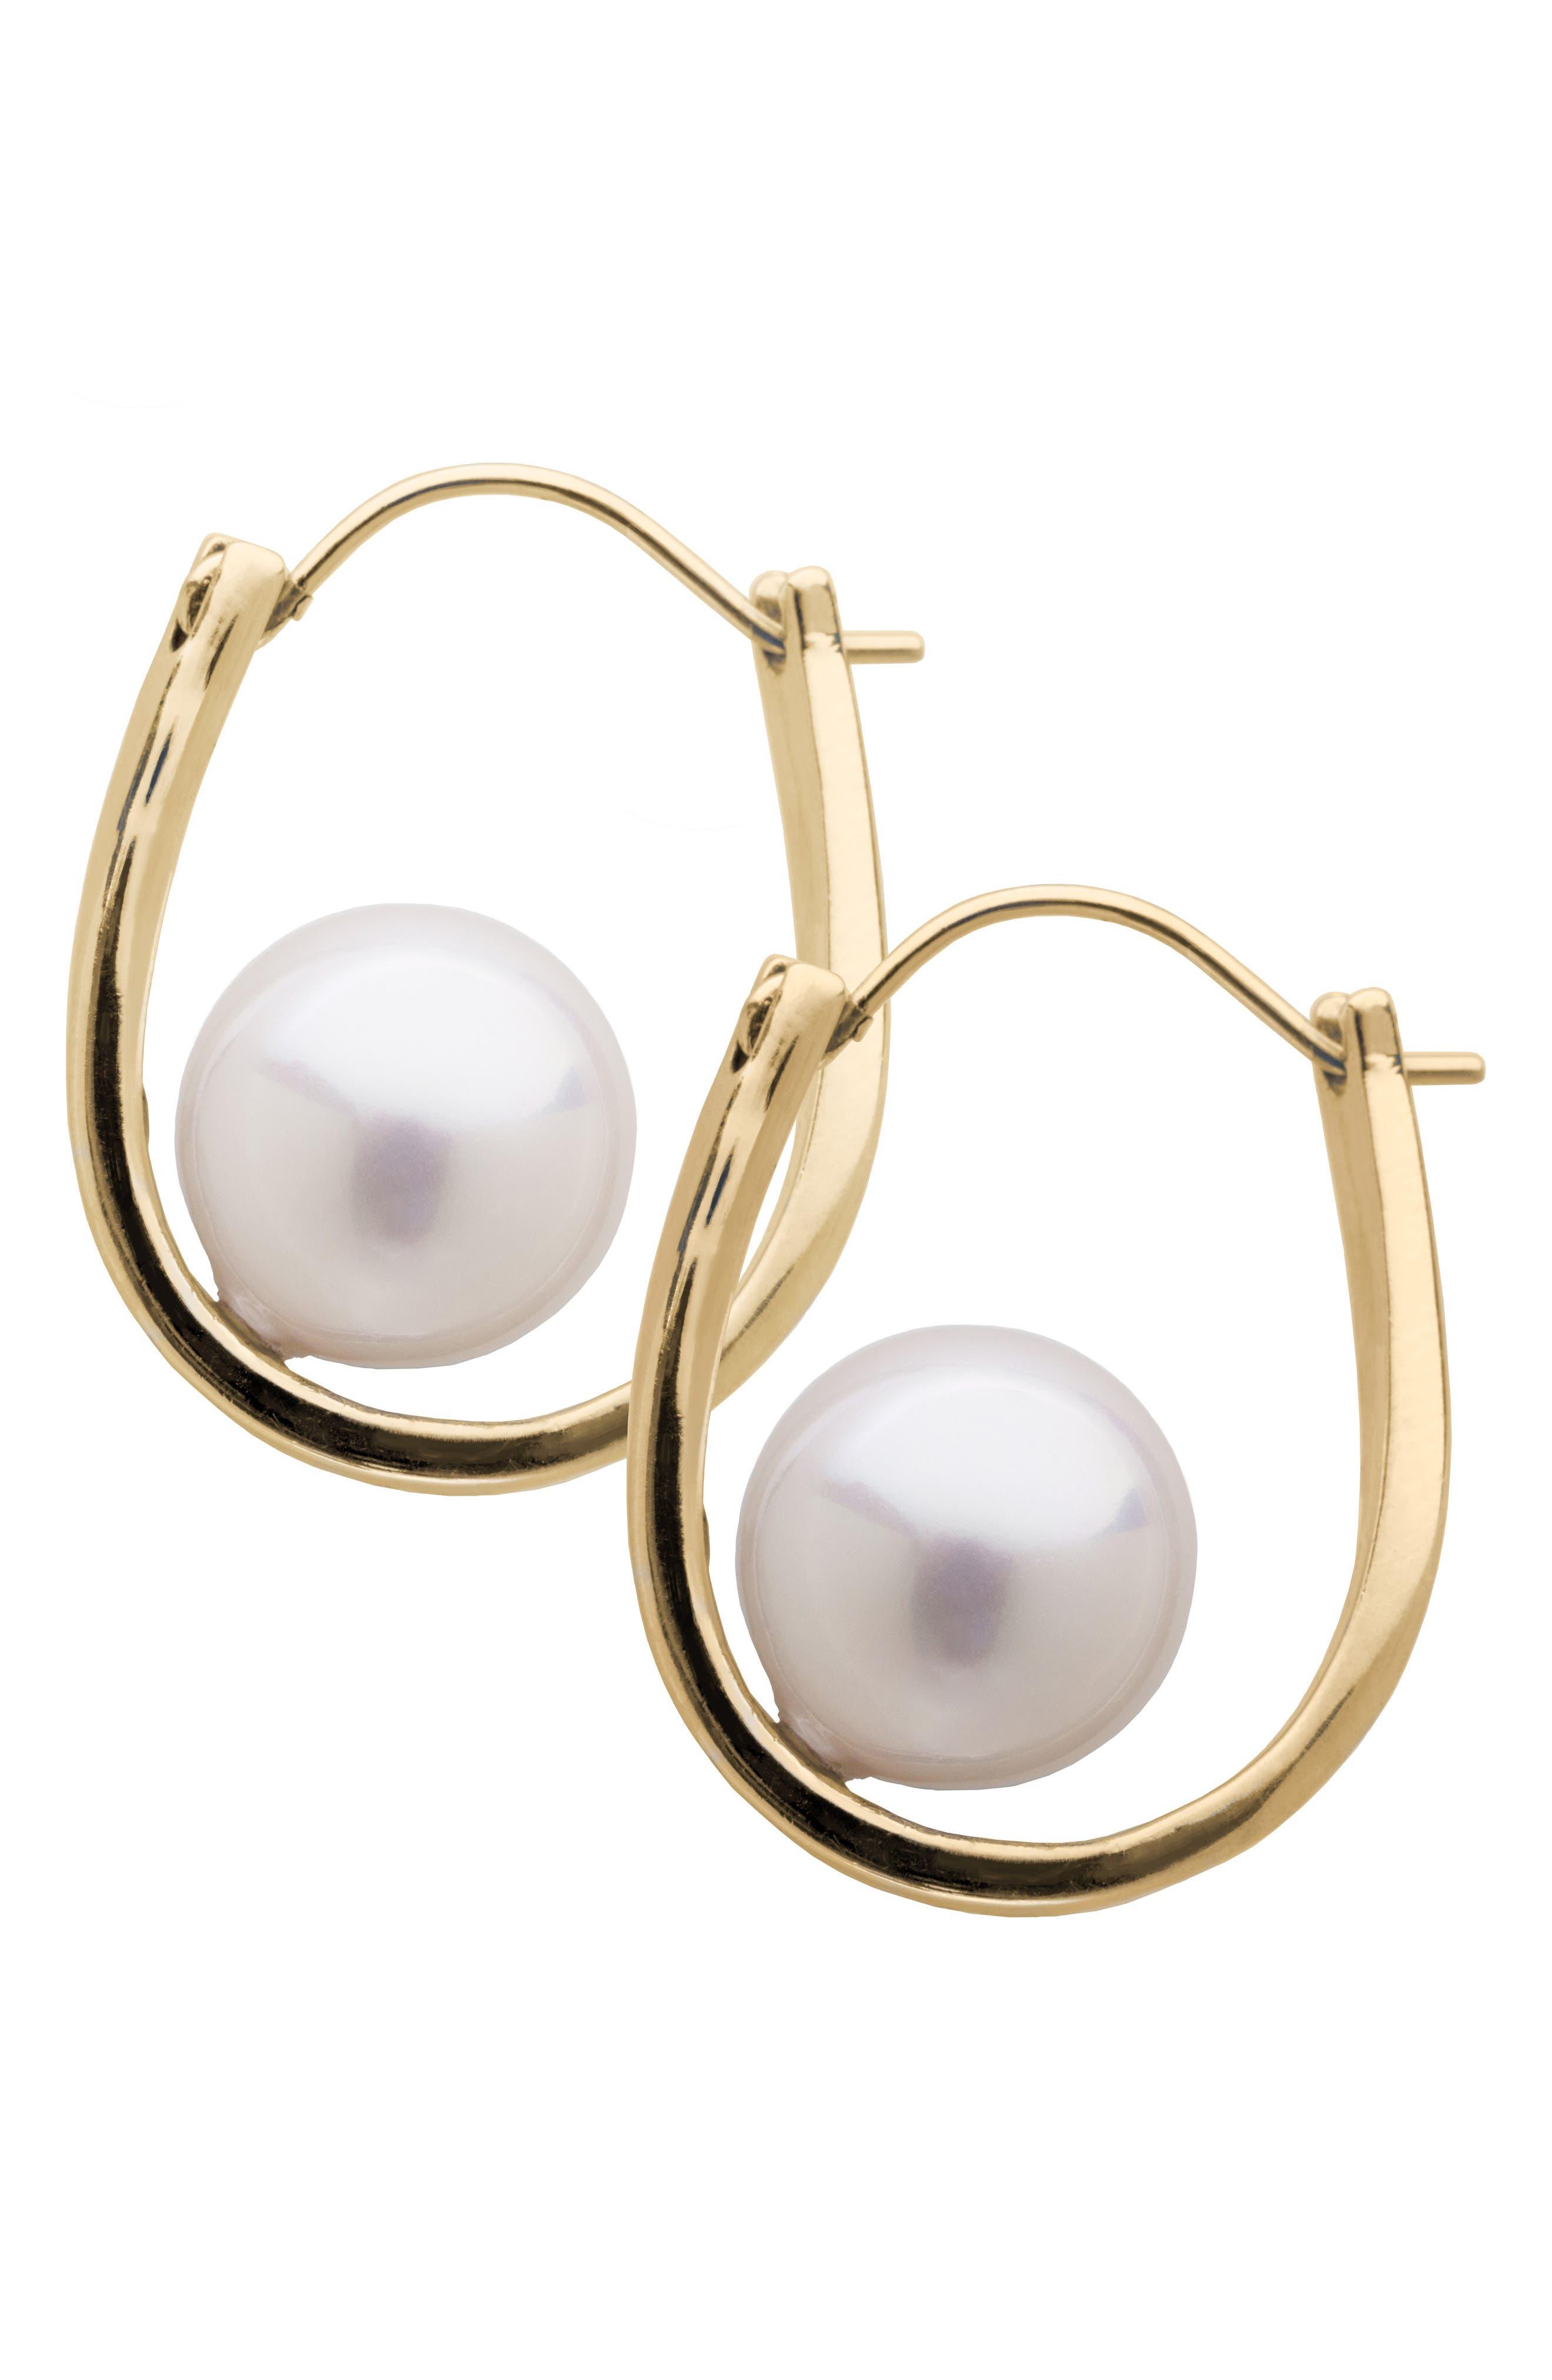 L. ERICKSON Simulated Pearl Hoop Earrings in Cream Pearl/ Gold